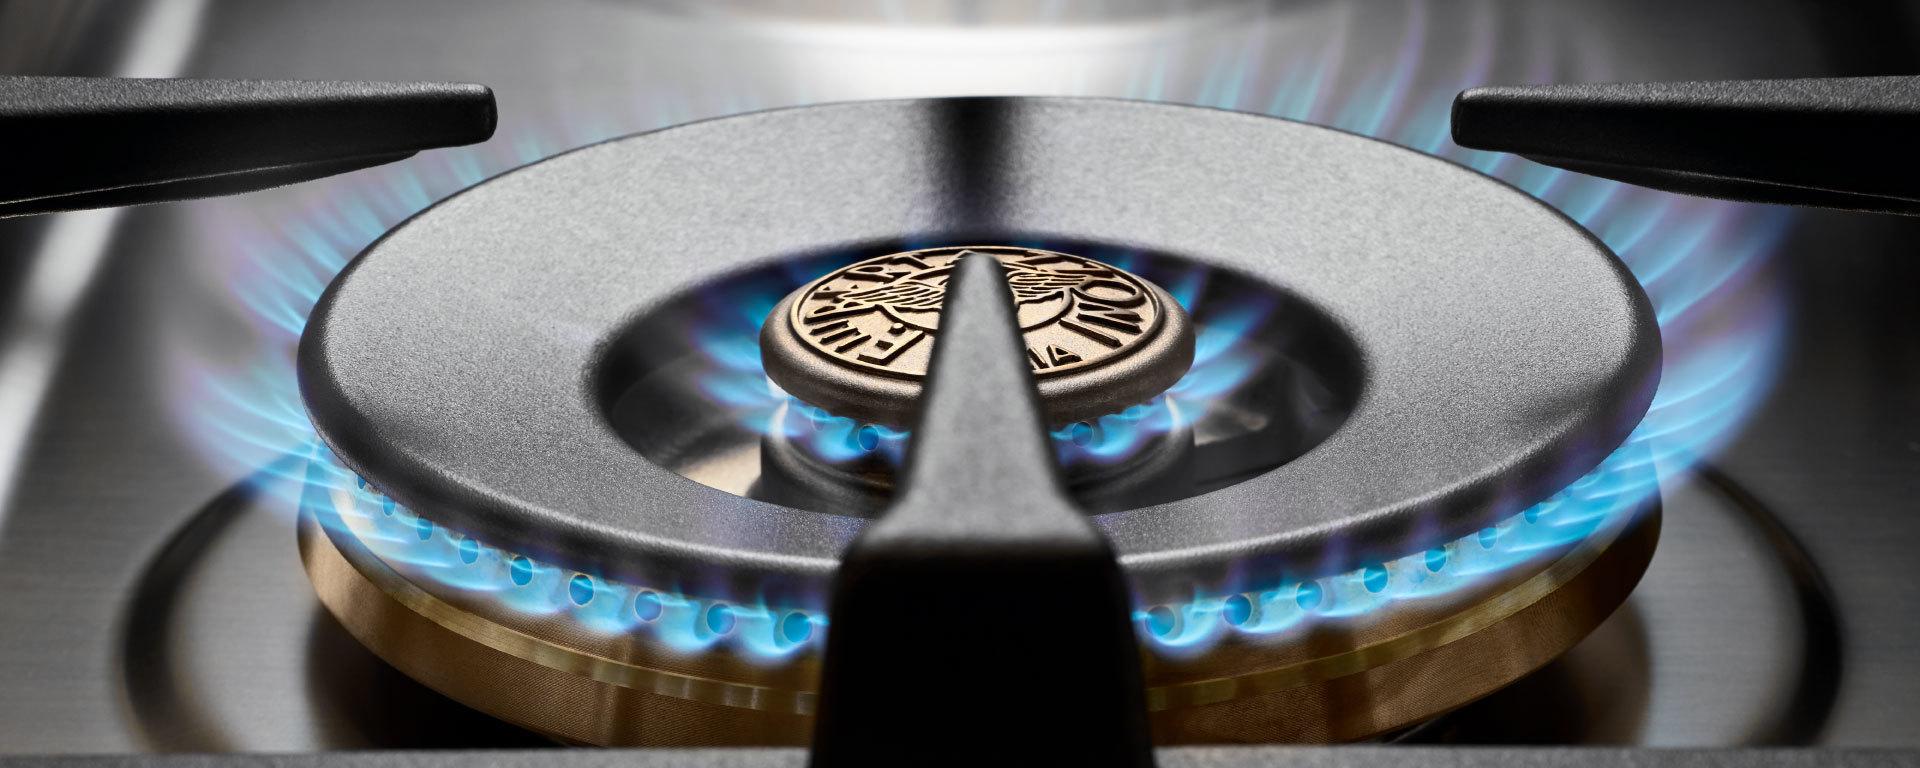 Газовая плита Bertazzoni PRO1006MFEDART